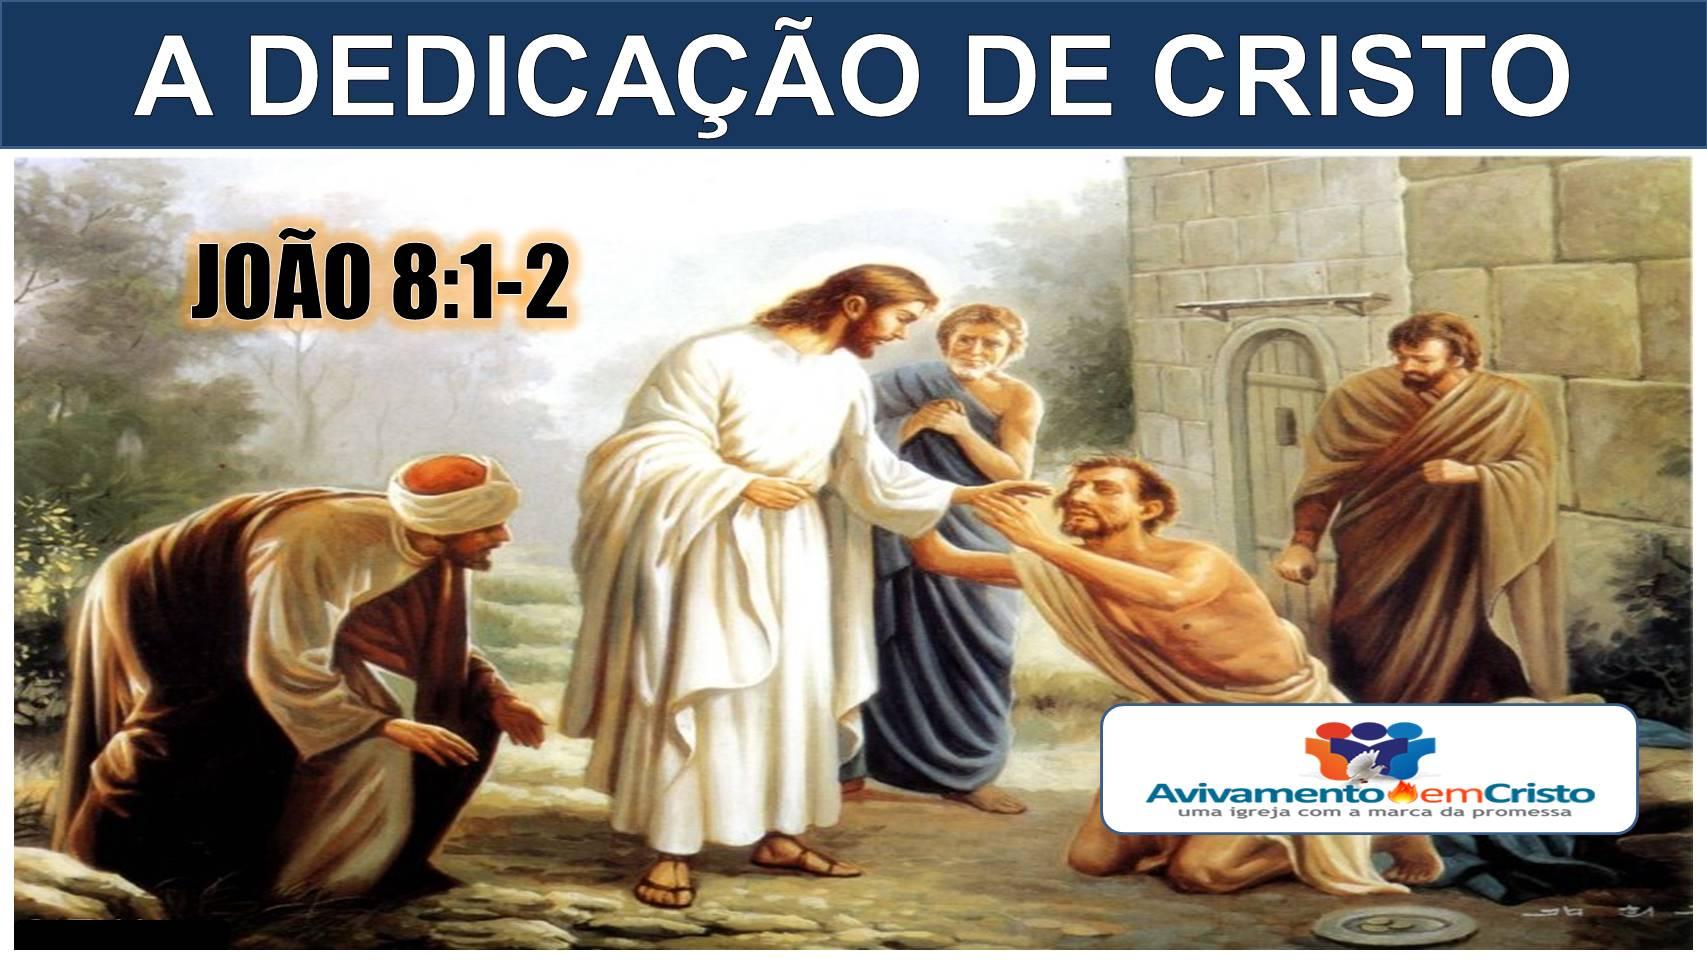 DEDICAÇAO DE CRISTO